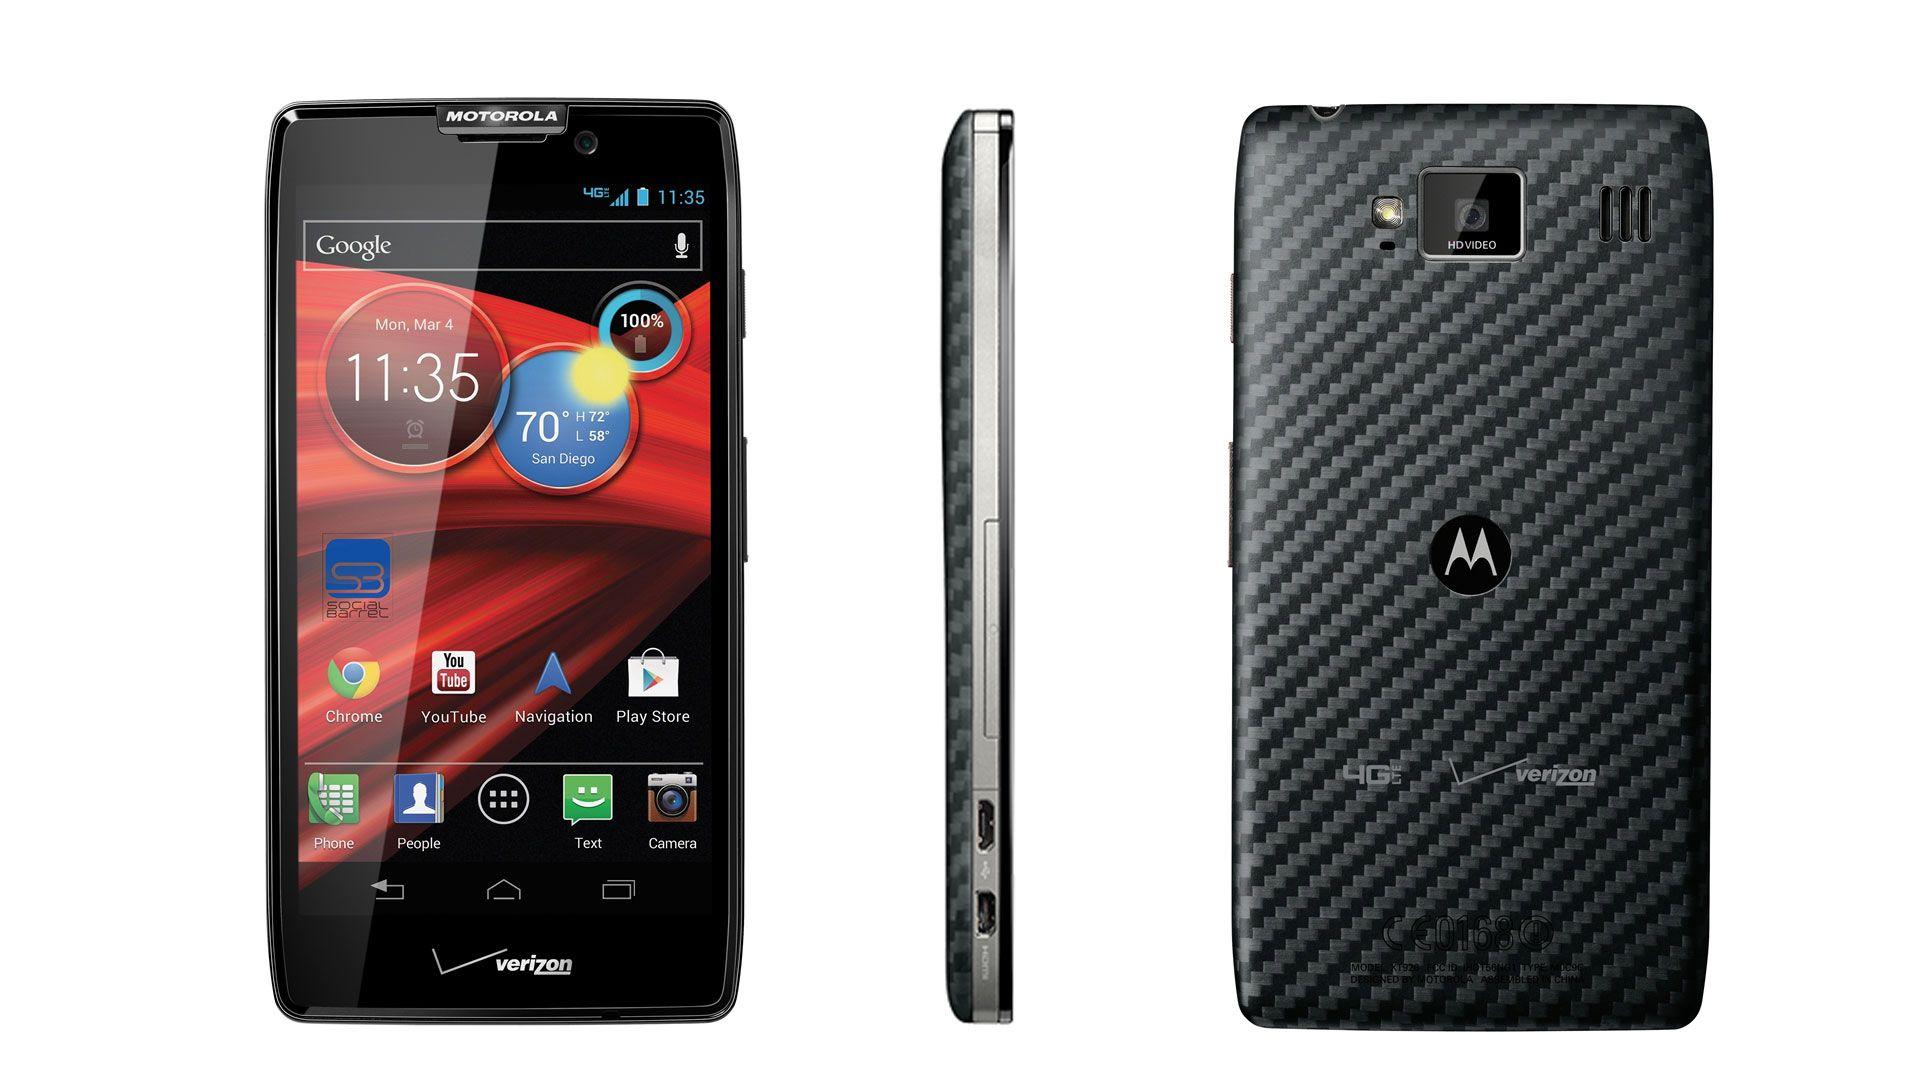 Motorola RAZR HD Best android phone, Motorola, Android phone